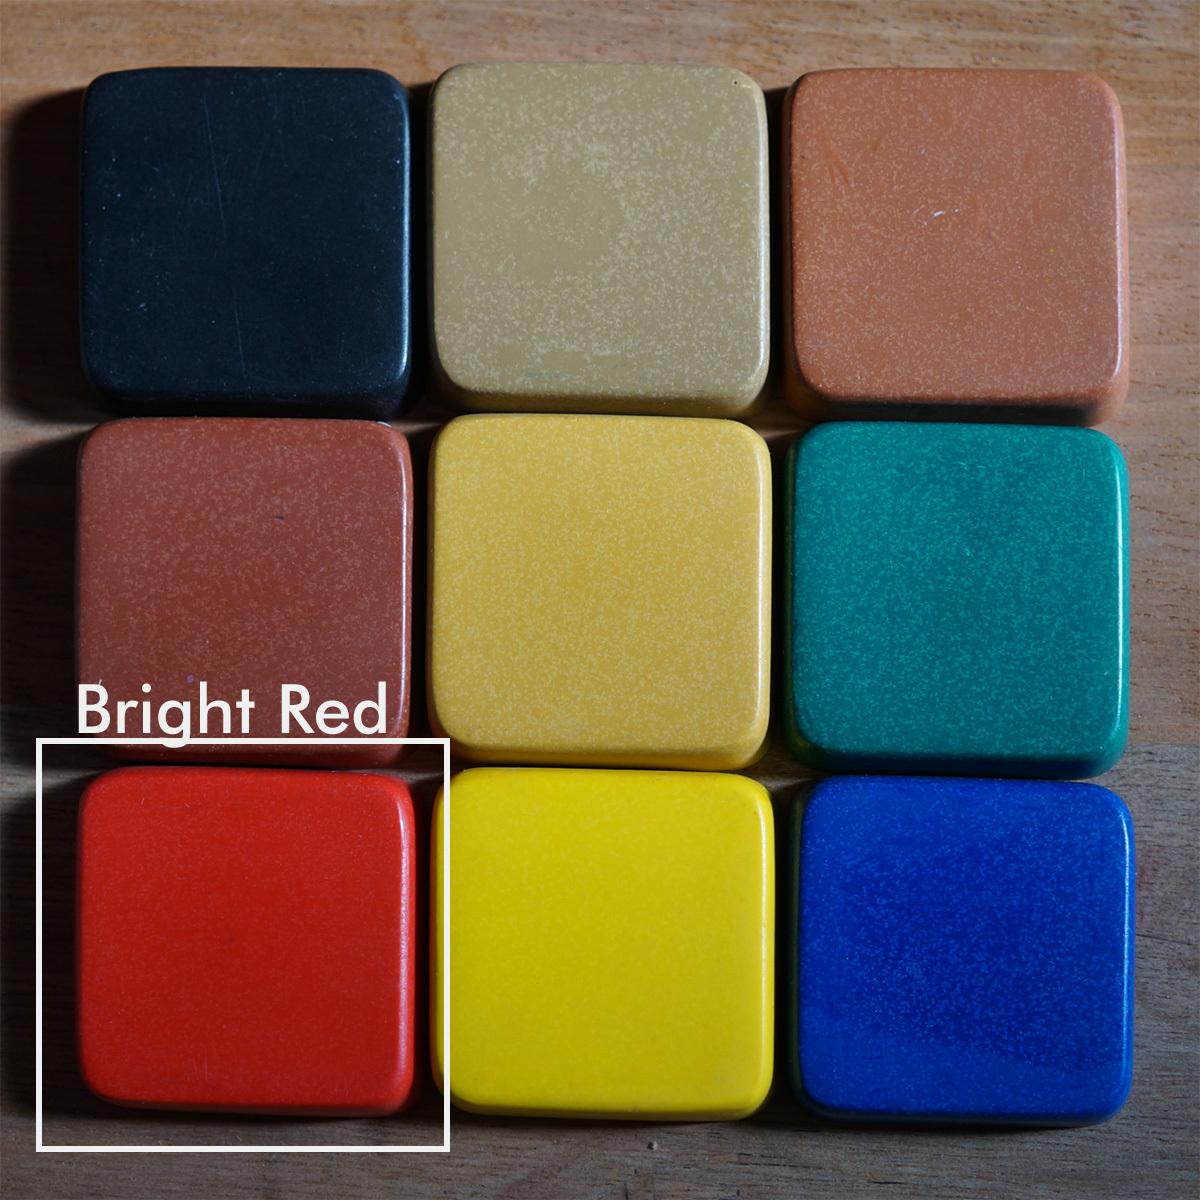 PIGMENT BRIGHT RED 1kg(着色剤:赤 1kg) - 画像2